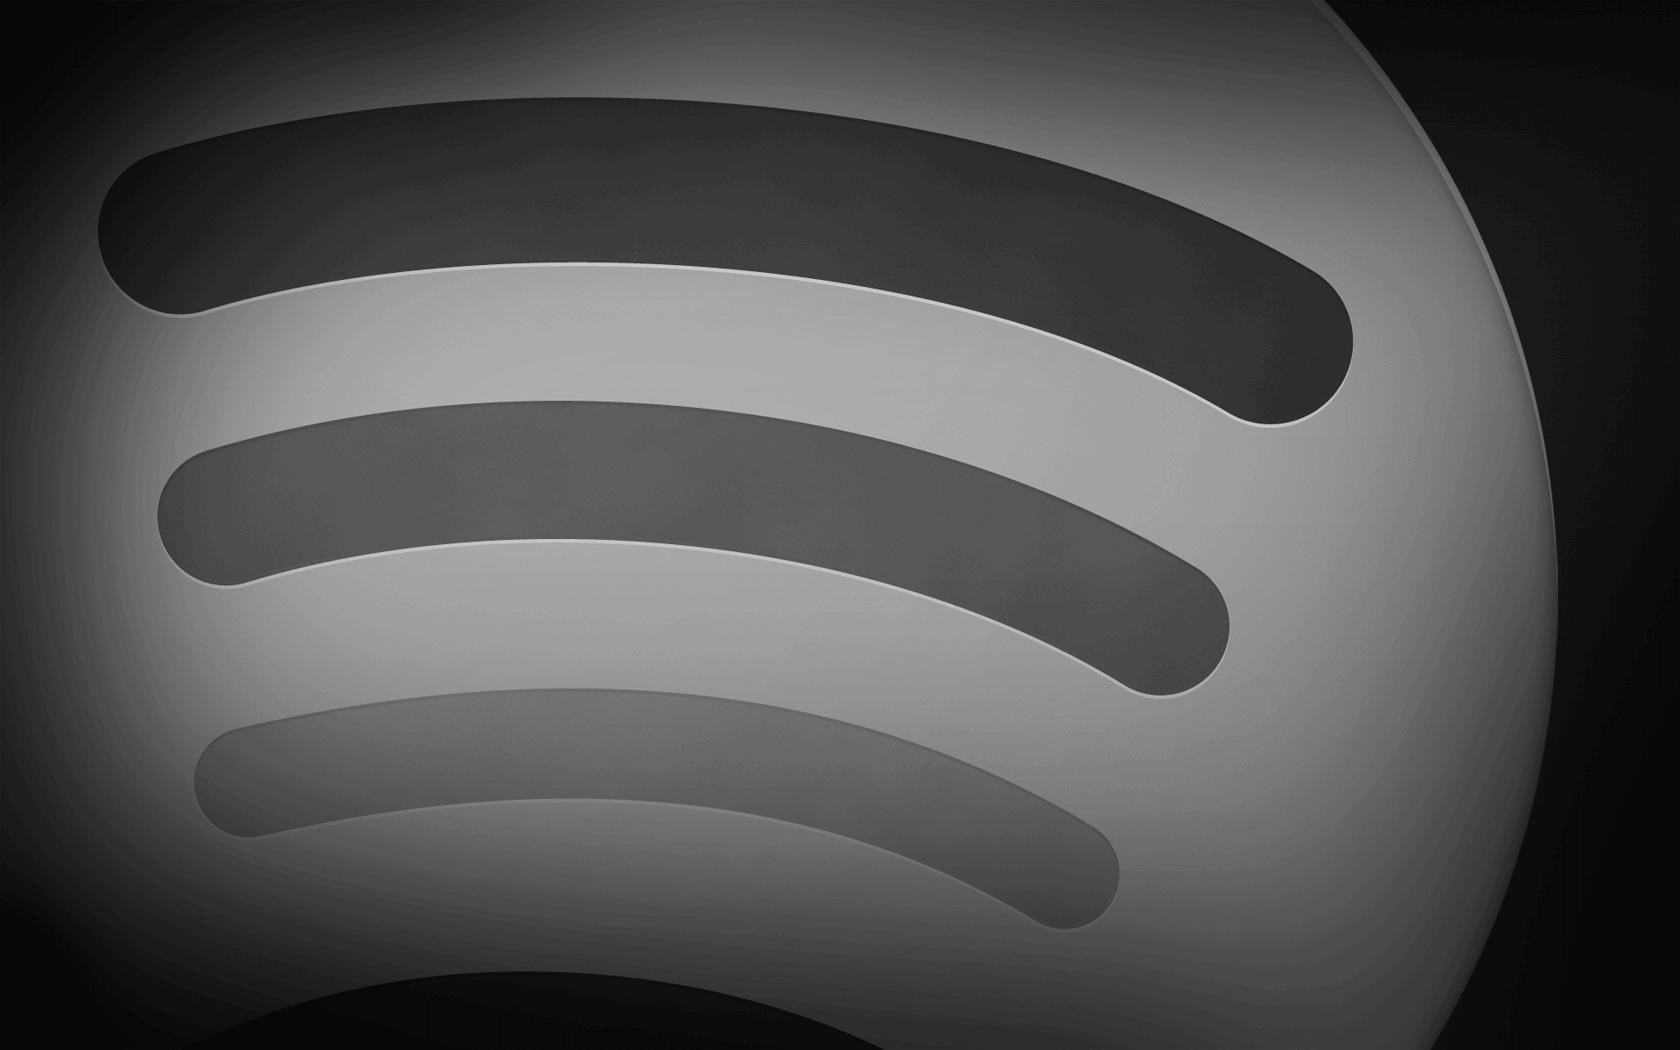 Hvad koster Spotify?